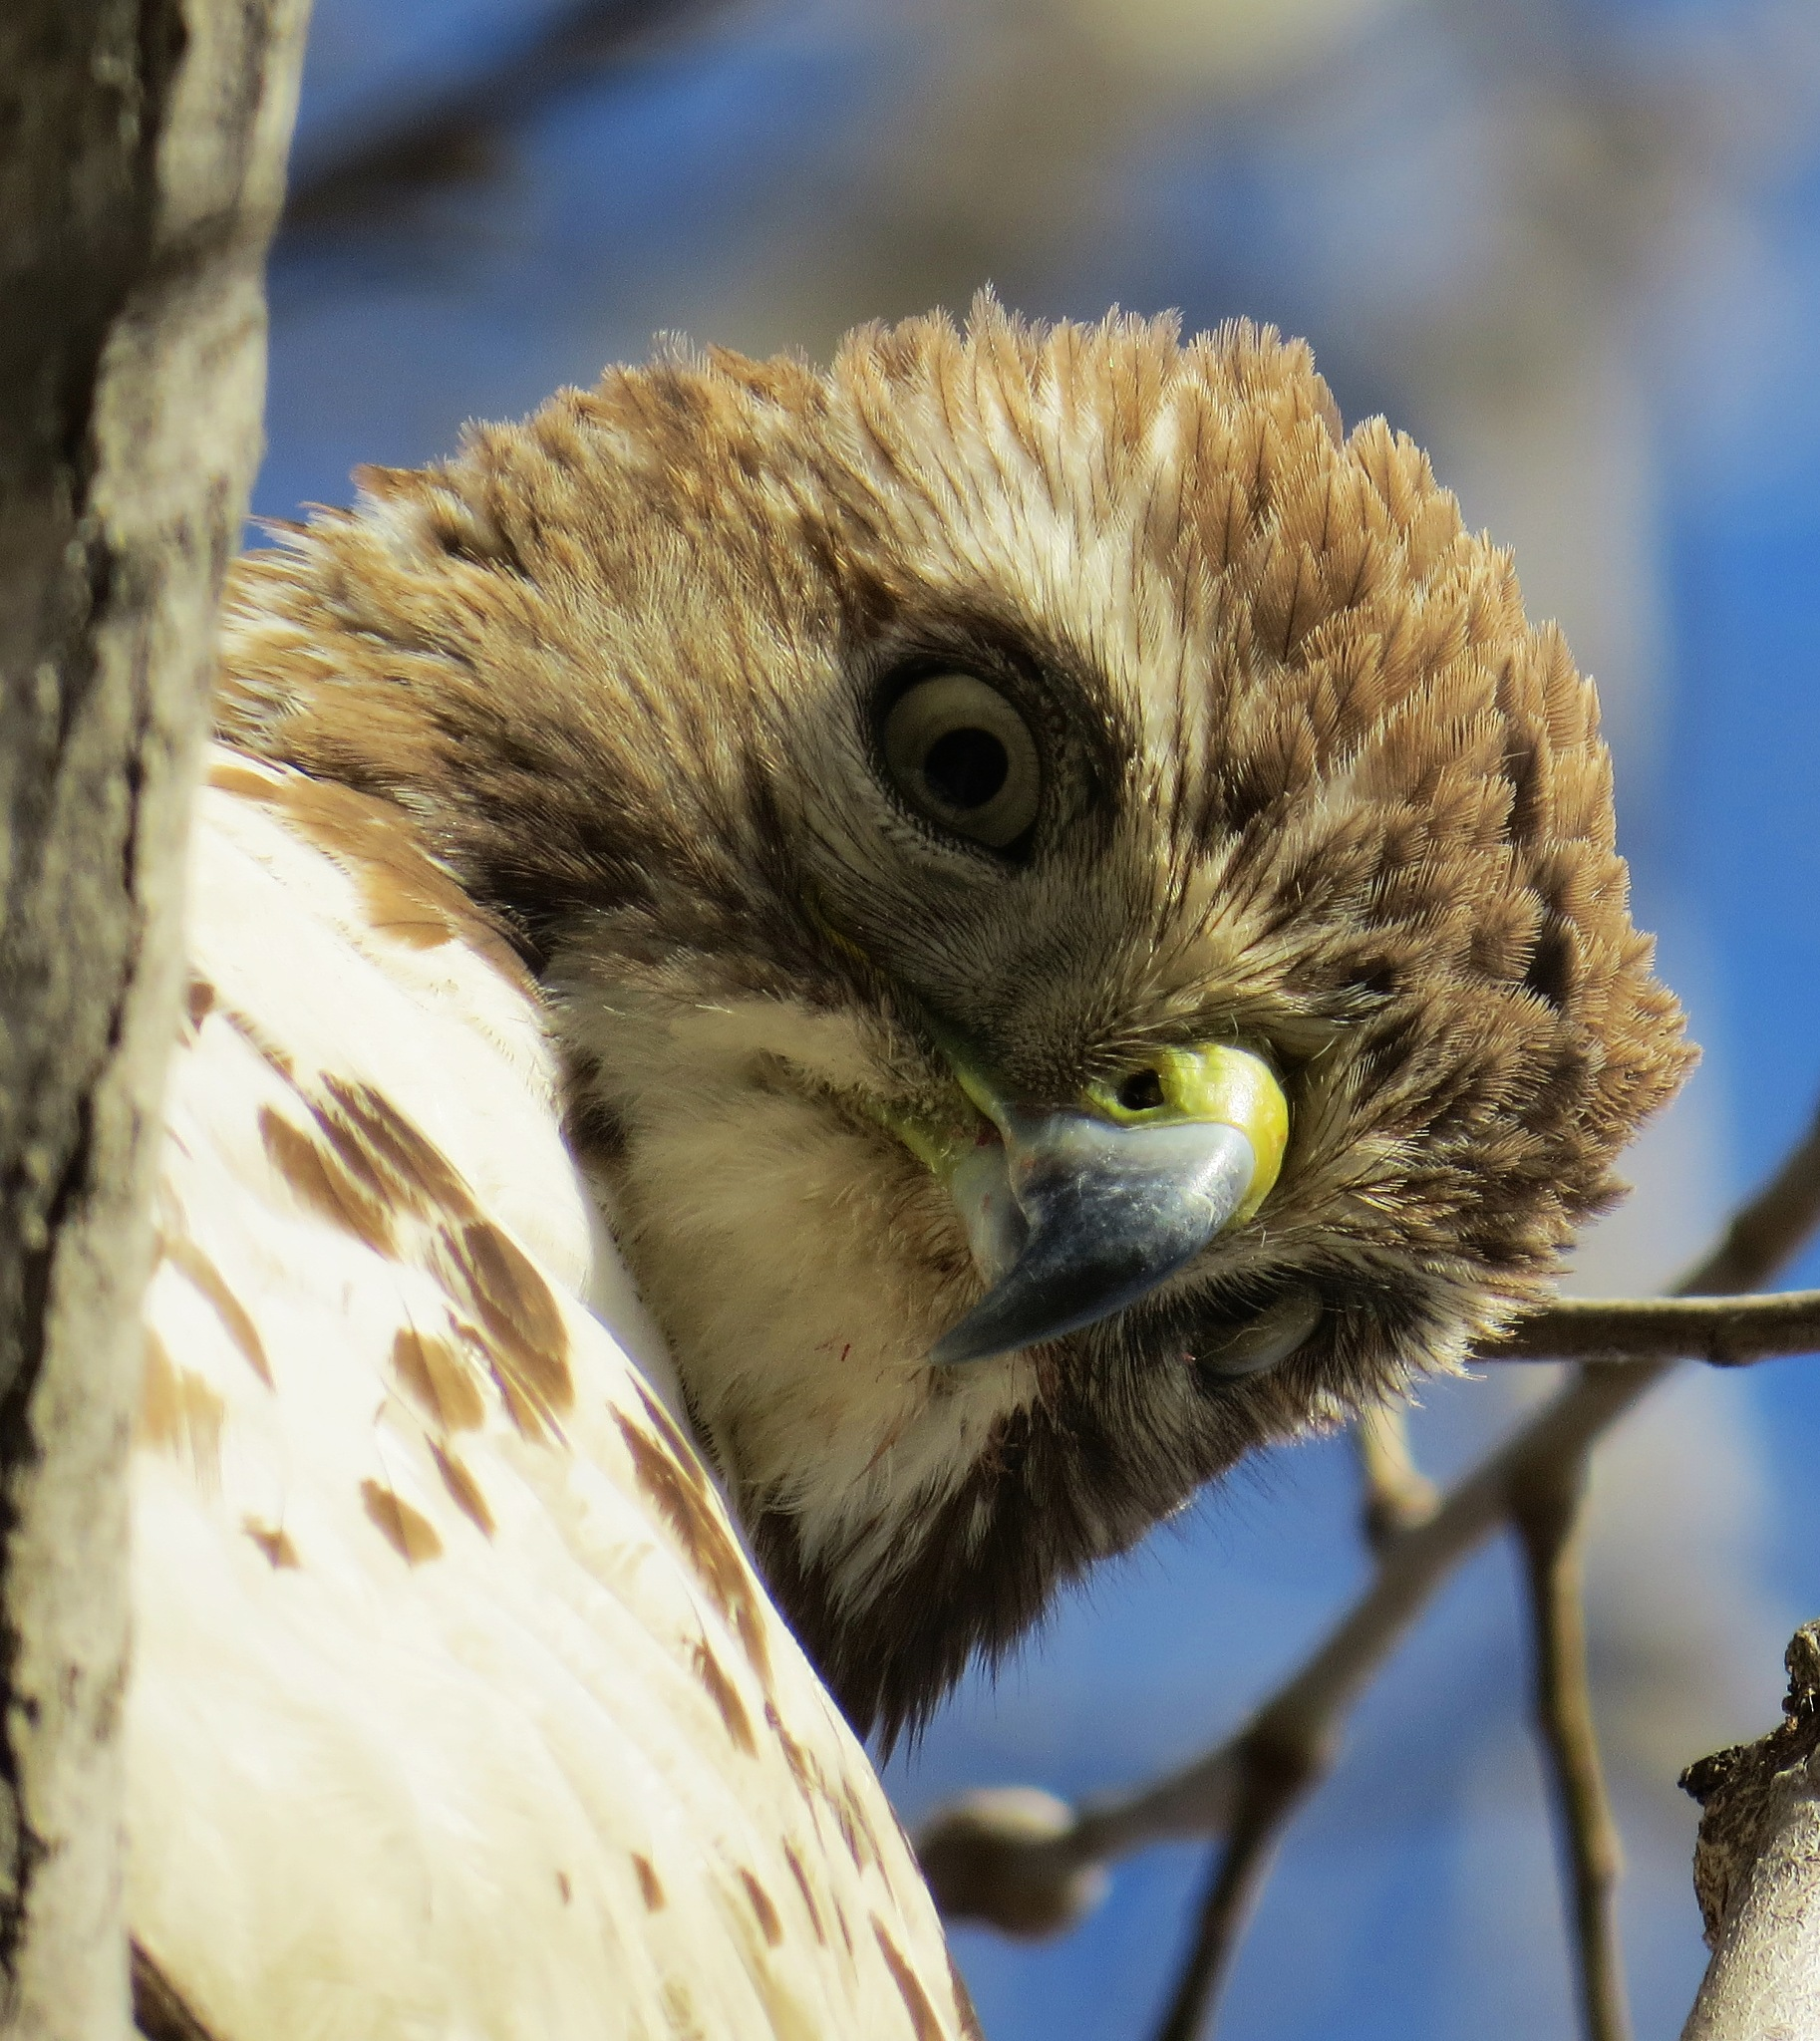 Red Tailed Hawk by bradfelton